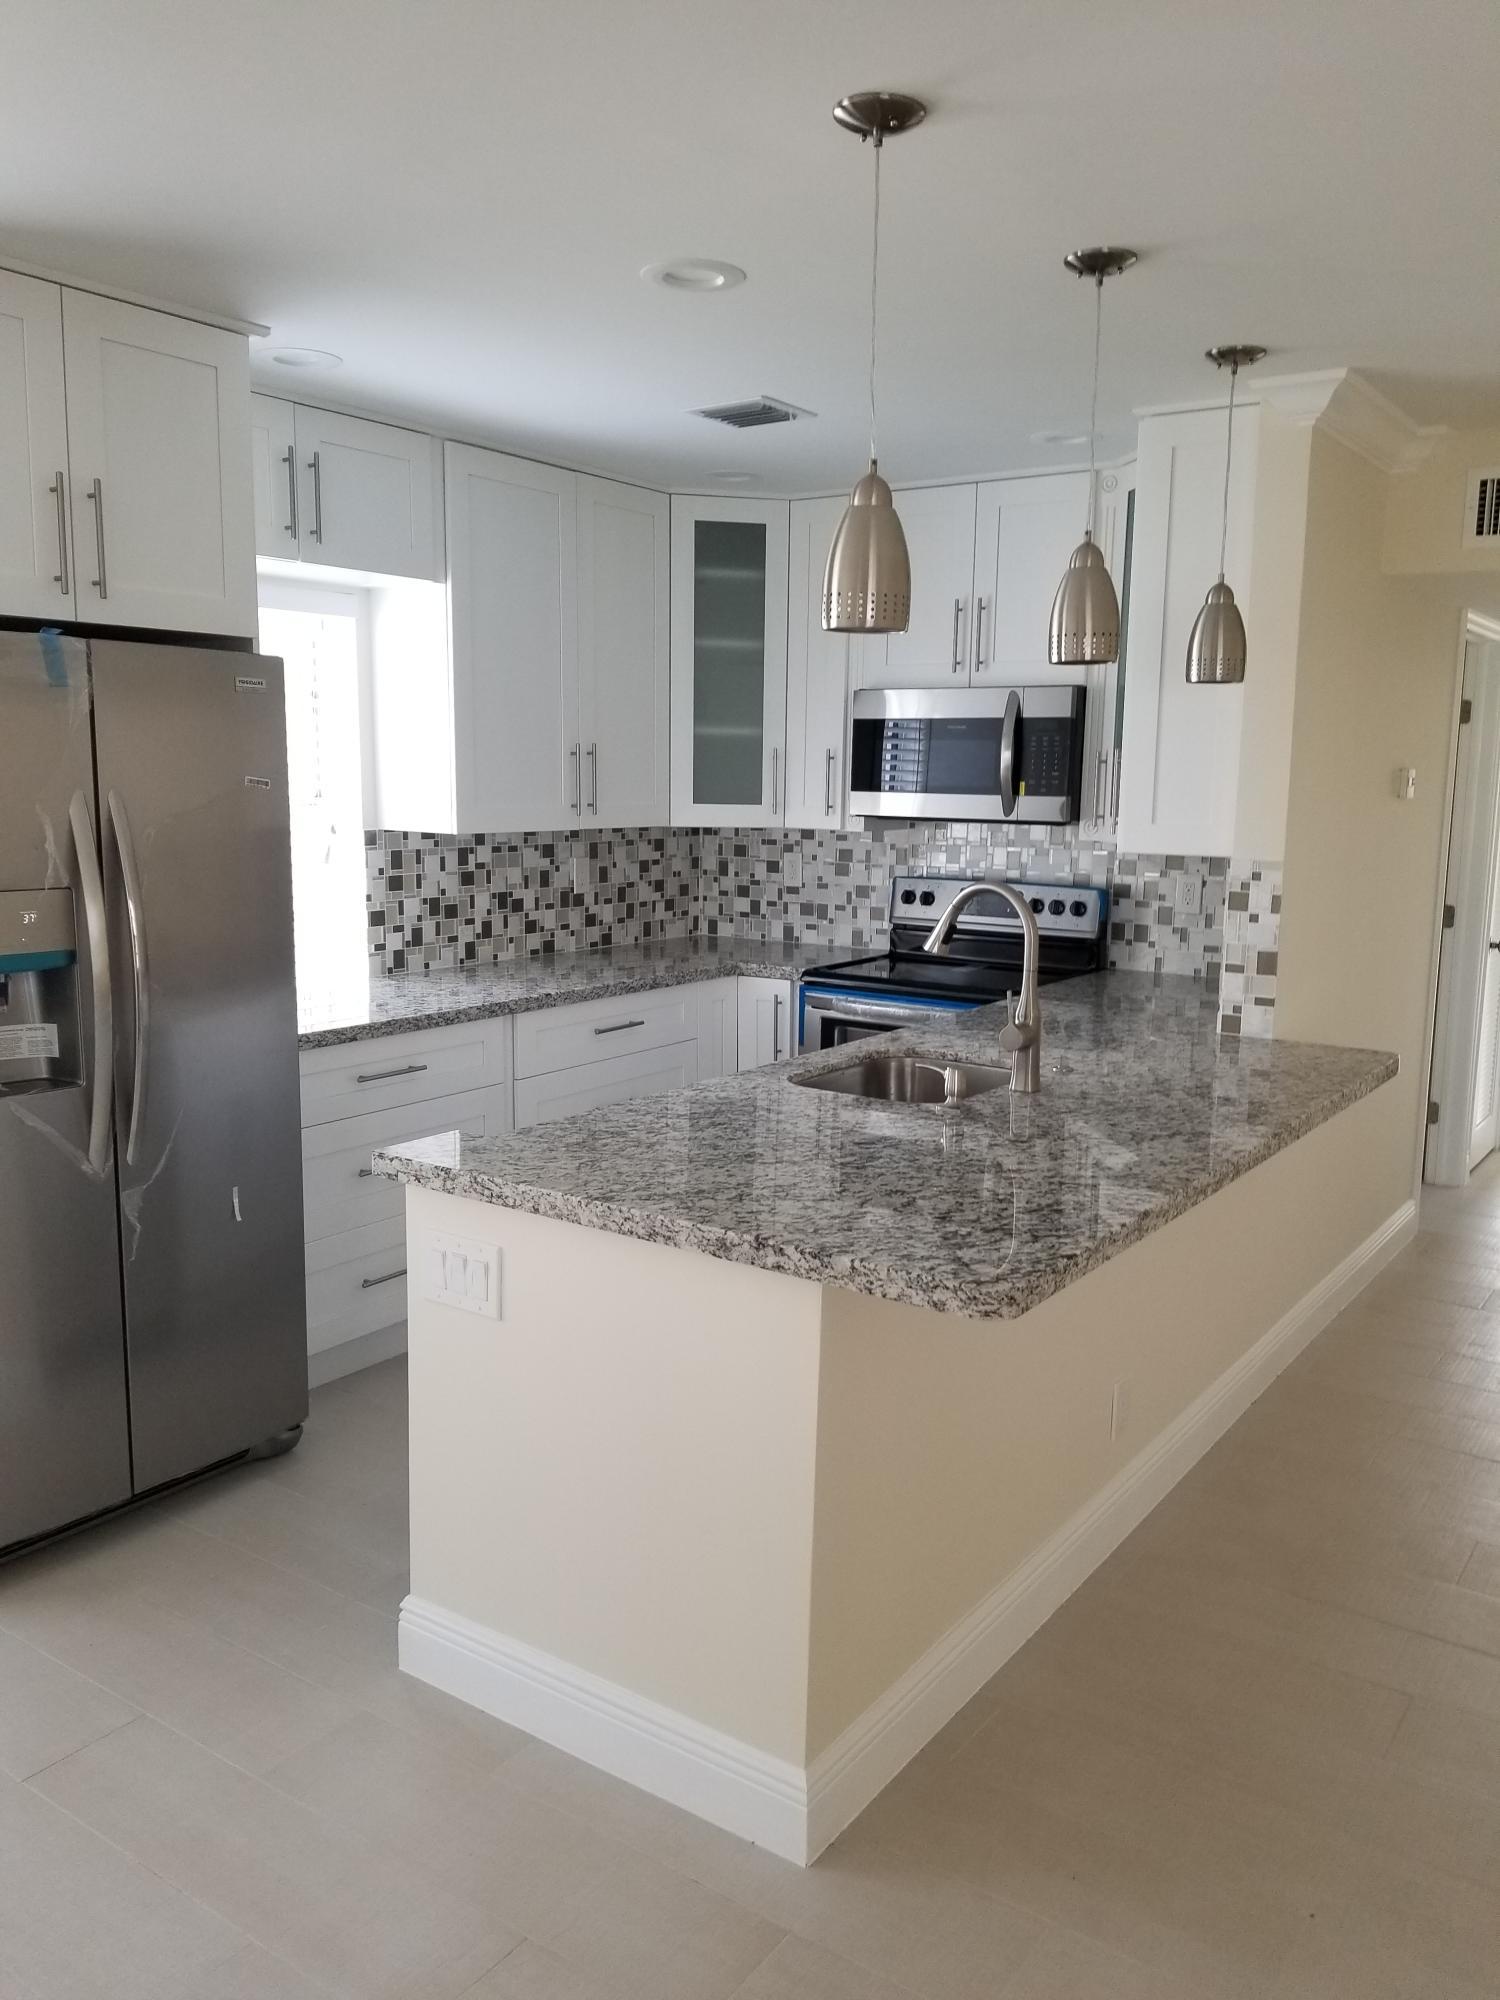 461 Burgundy J, Delray Beach, Florida 33484, 2 Bedrooms Bedrooms, ,2 BathroomsBathrooms,Condo/Coop,For Rent,Kings Point,Burgundy J,2,RX-10498933